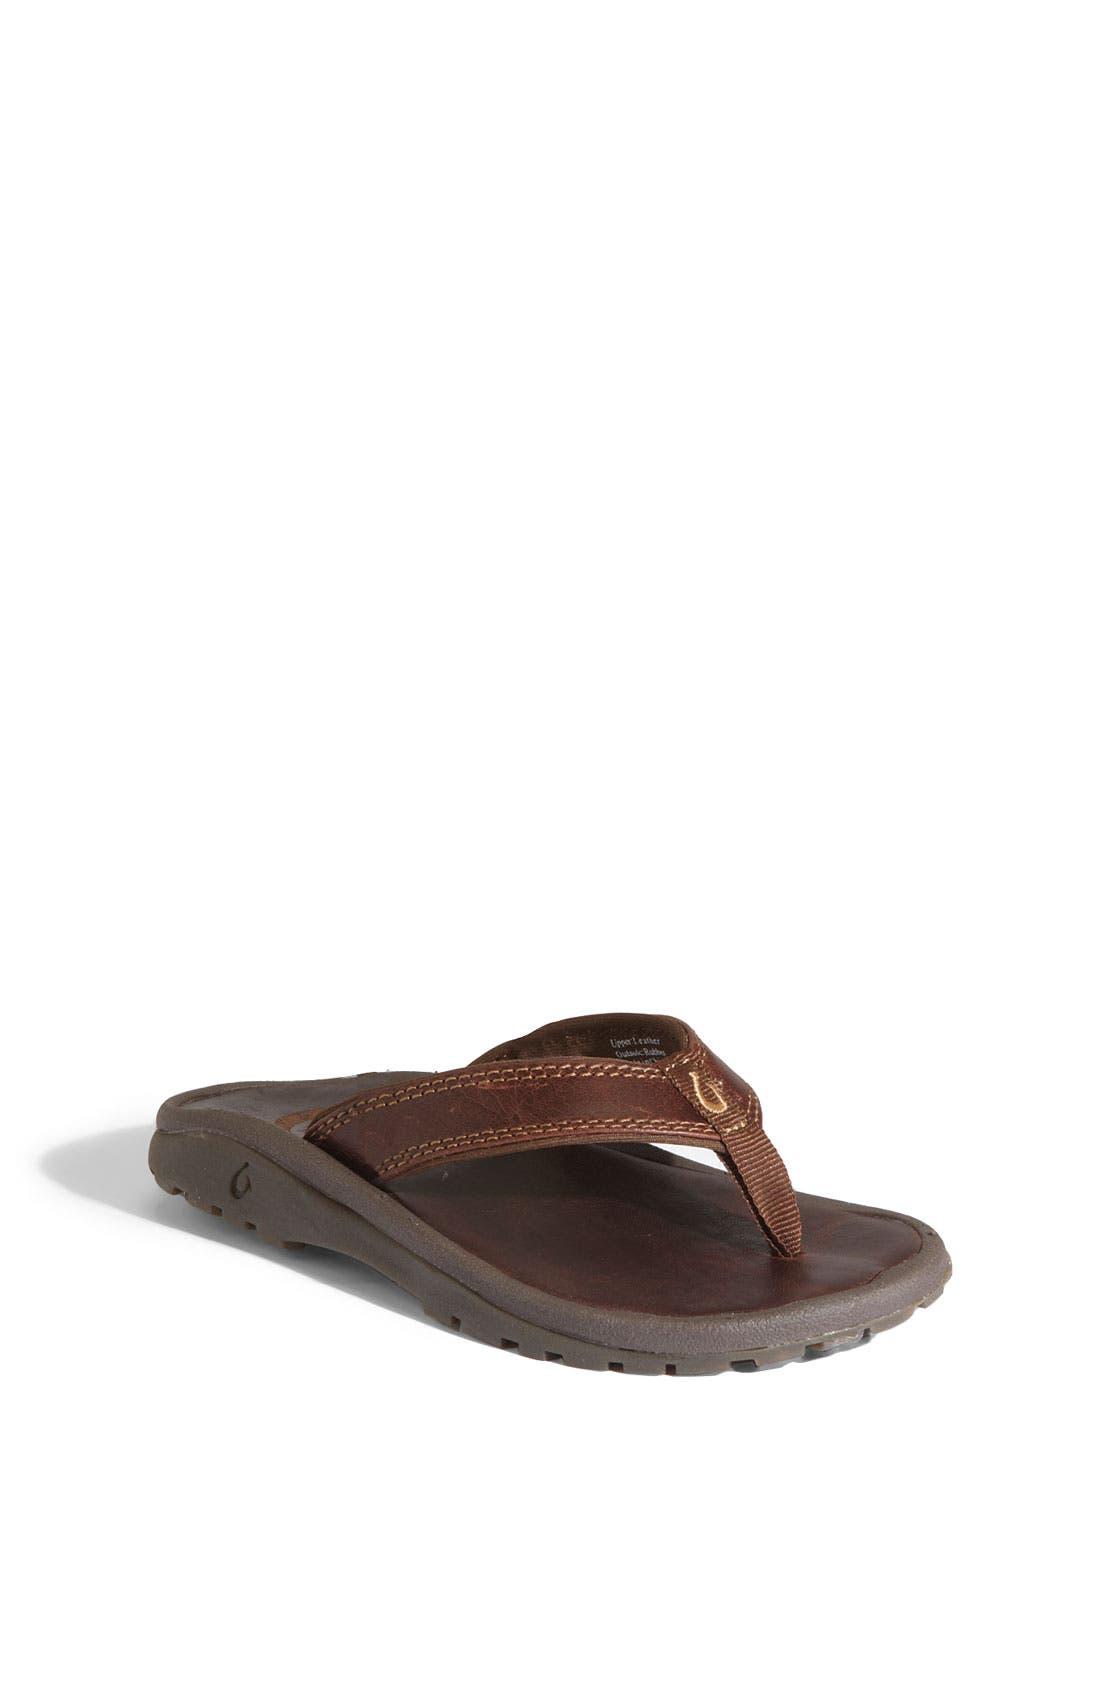 Alternate Image 1 Selected - OluKai 'Ohana' Leather Sandal (Toddler, Little Kid & Big Kid)